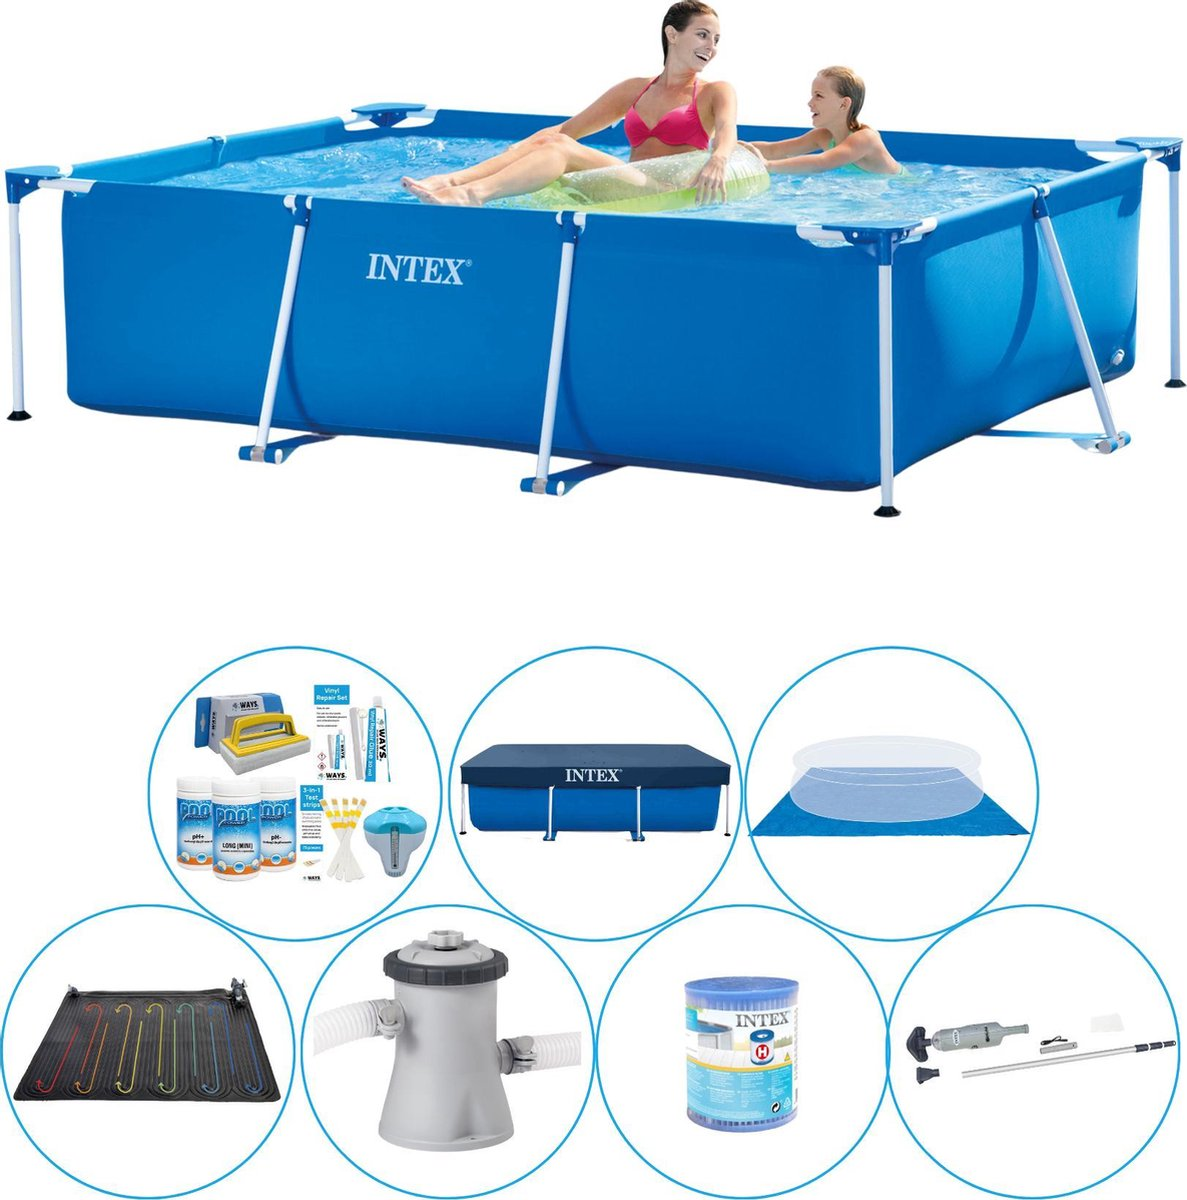 Intex Frame Pool Zwembad - 220 x 150 x 60 cm - Totaal pakket